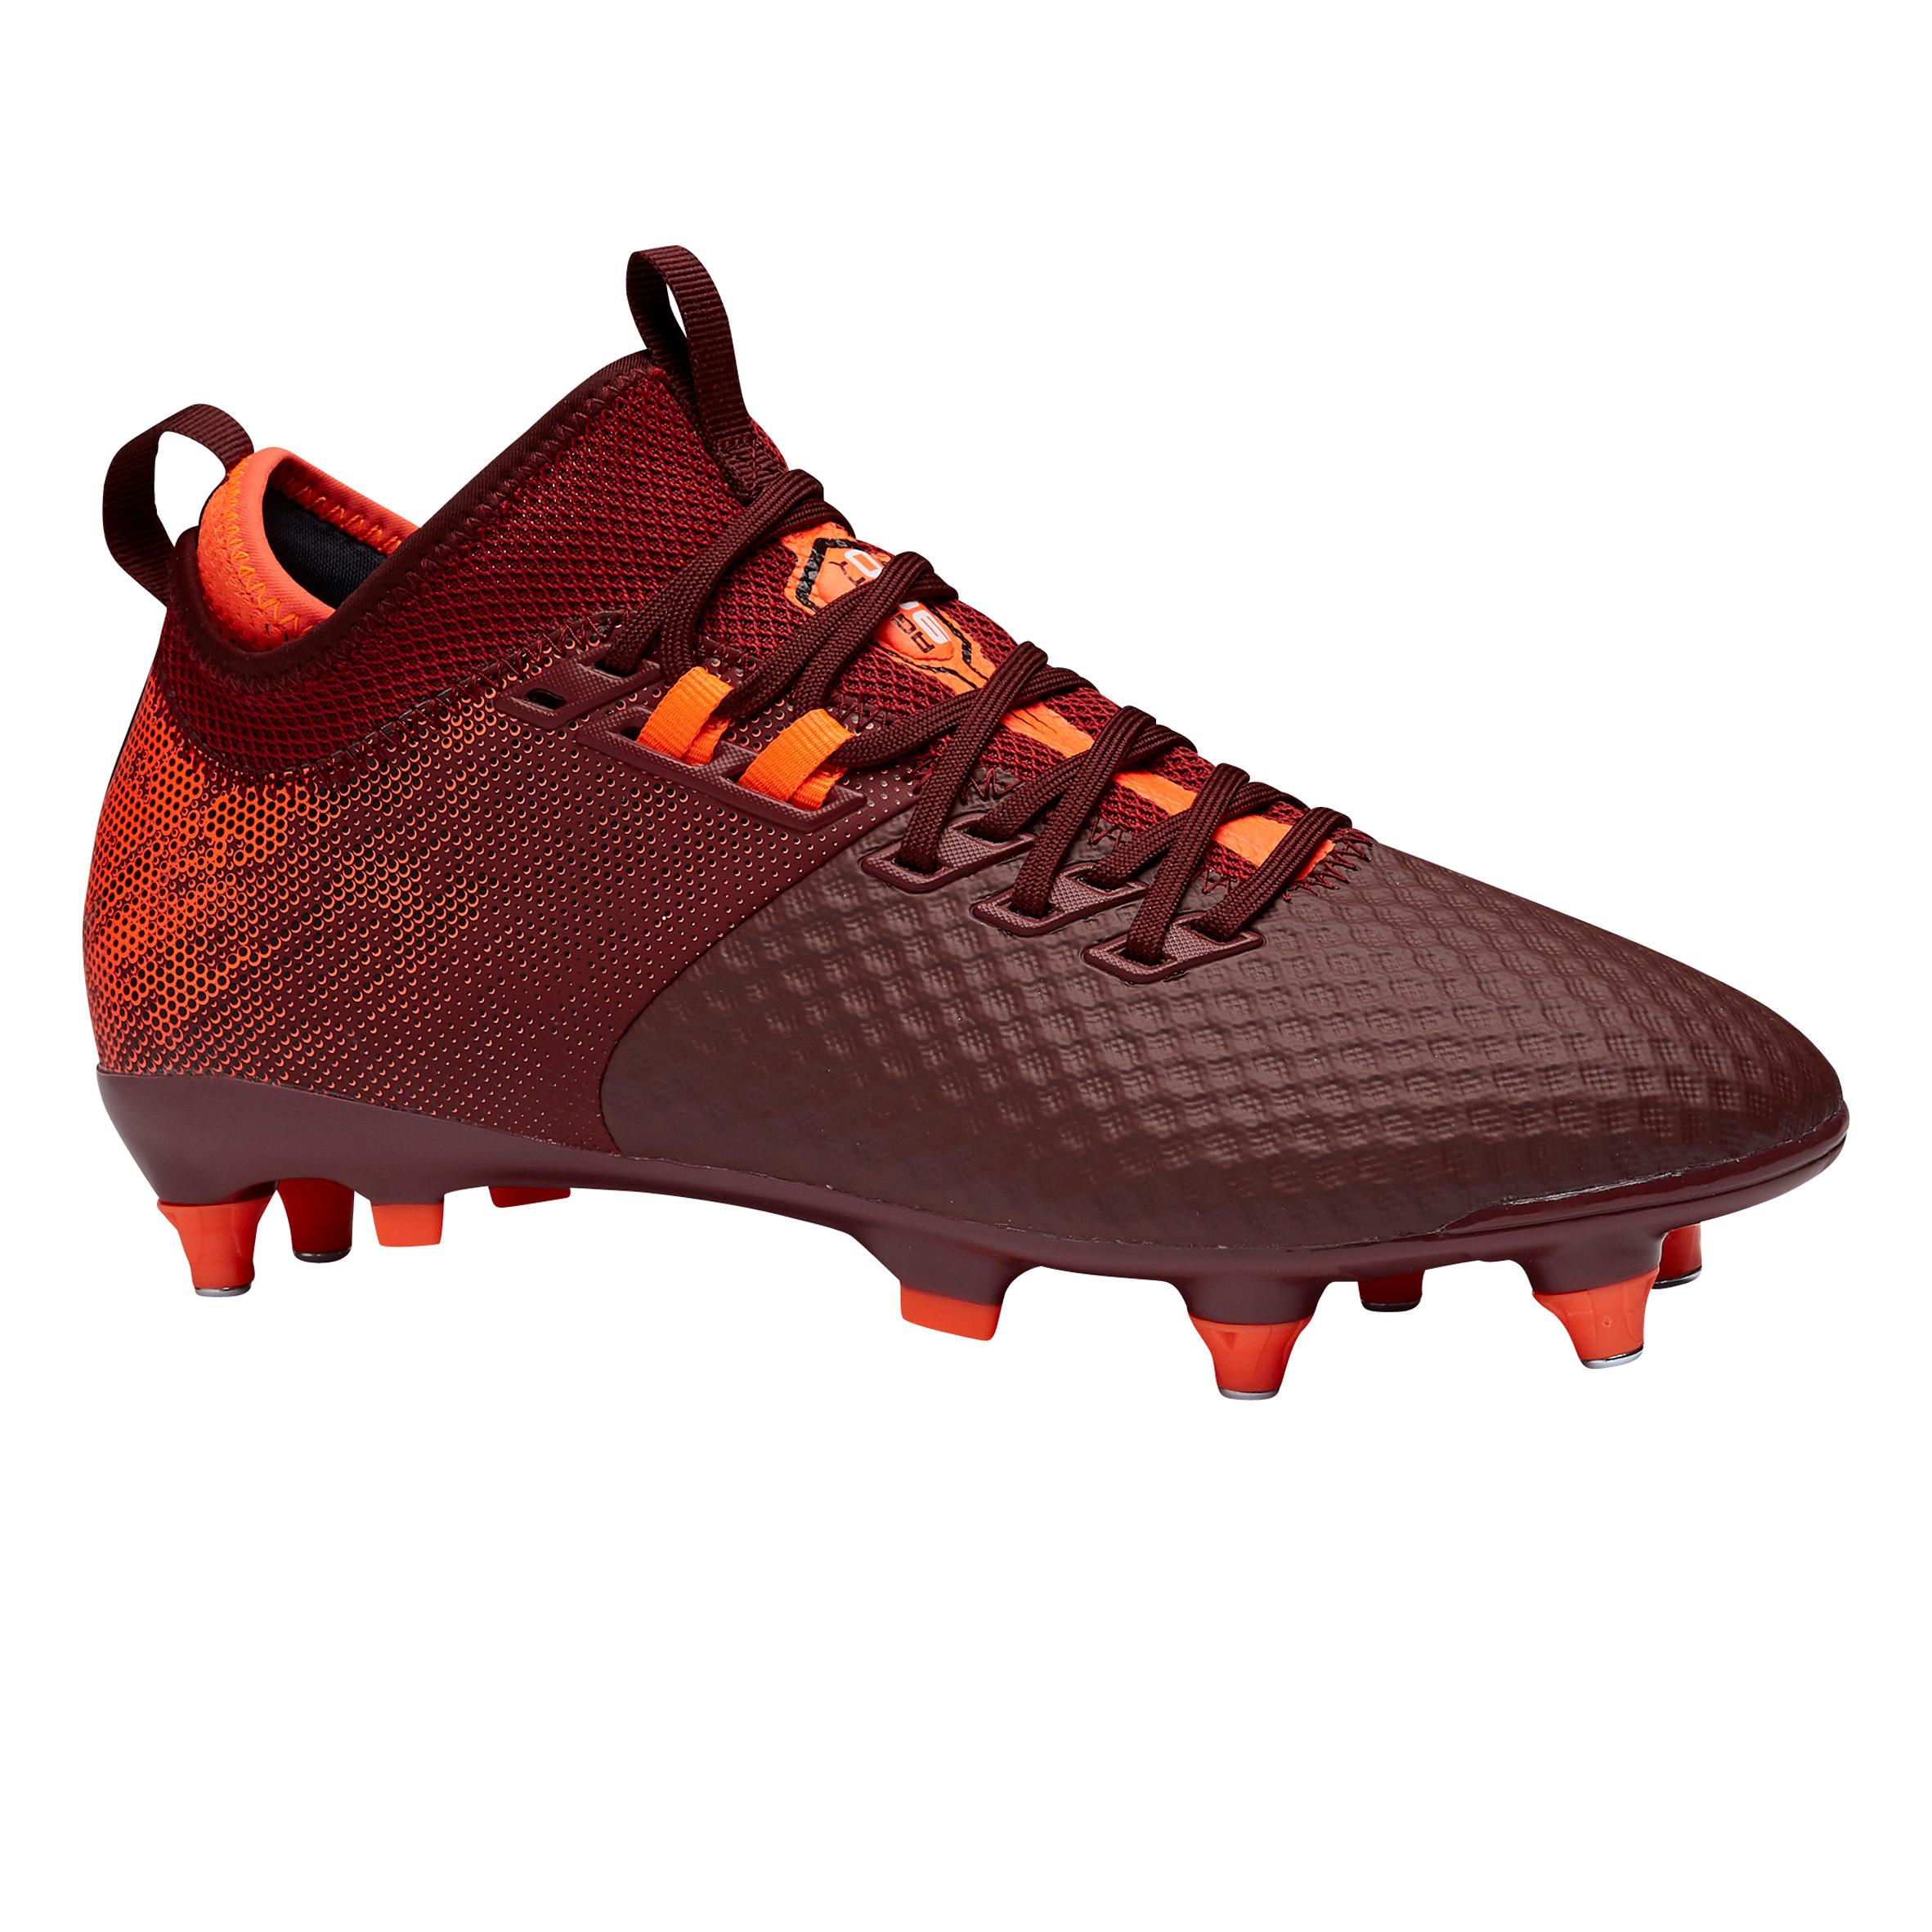 Fußballschuhe Stollen Agility 900 Mesh Mid SG Erwachsene bordeaux | Schuhe > Sportschuhe > Fußballschuhe | Kipsta